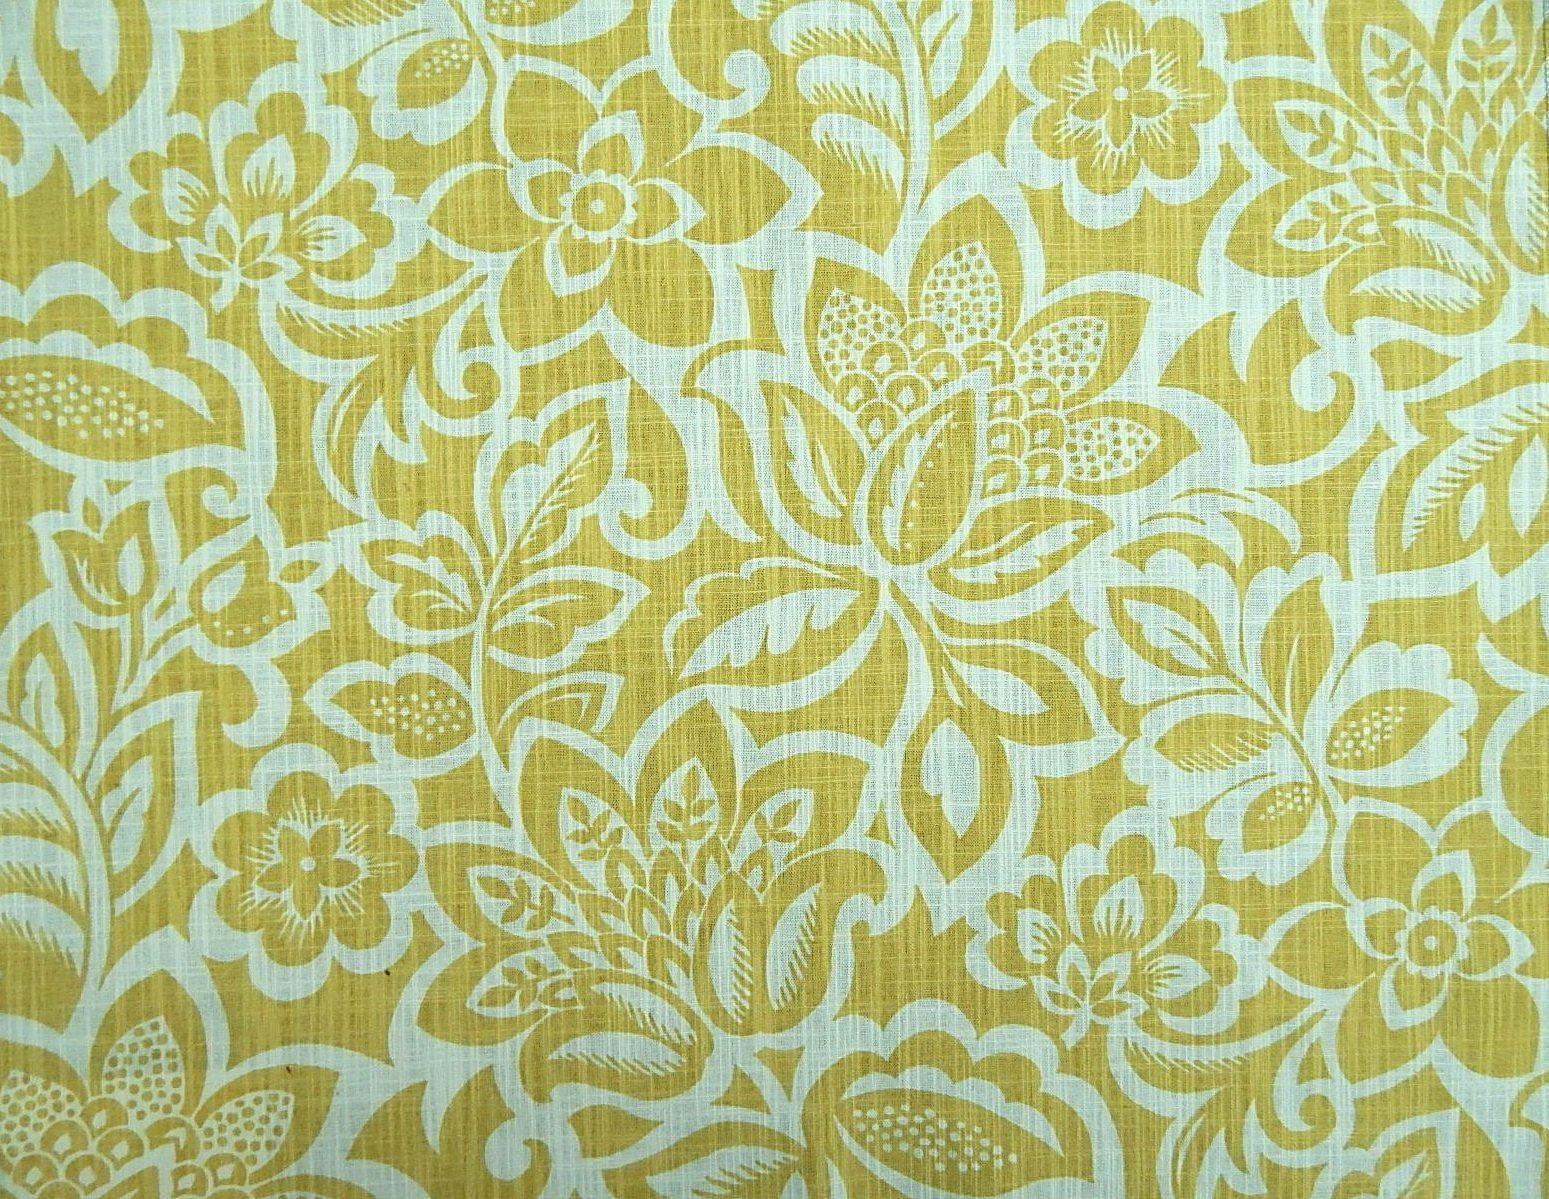 Richloom Fabrics Venay Sunlight 1502 Fabrics Fabric Color